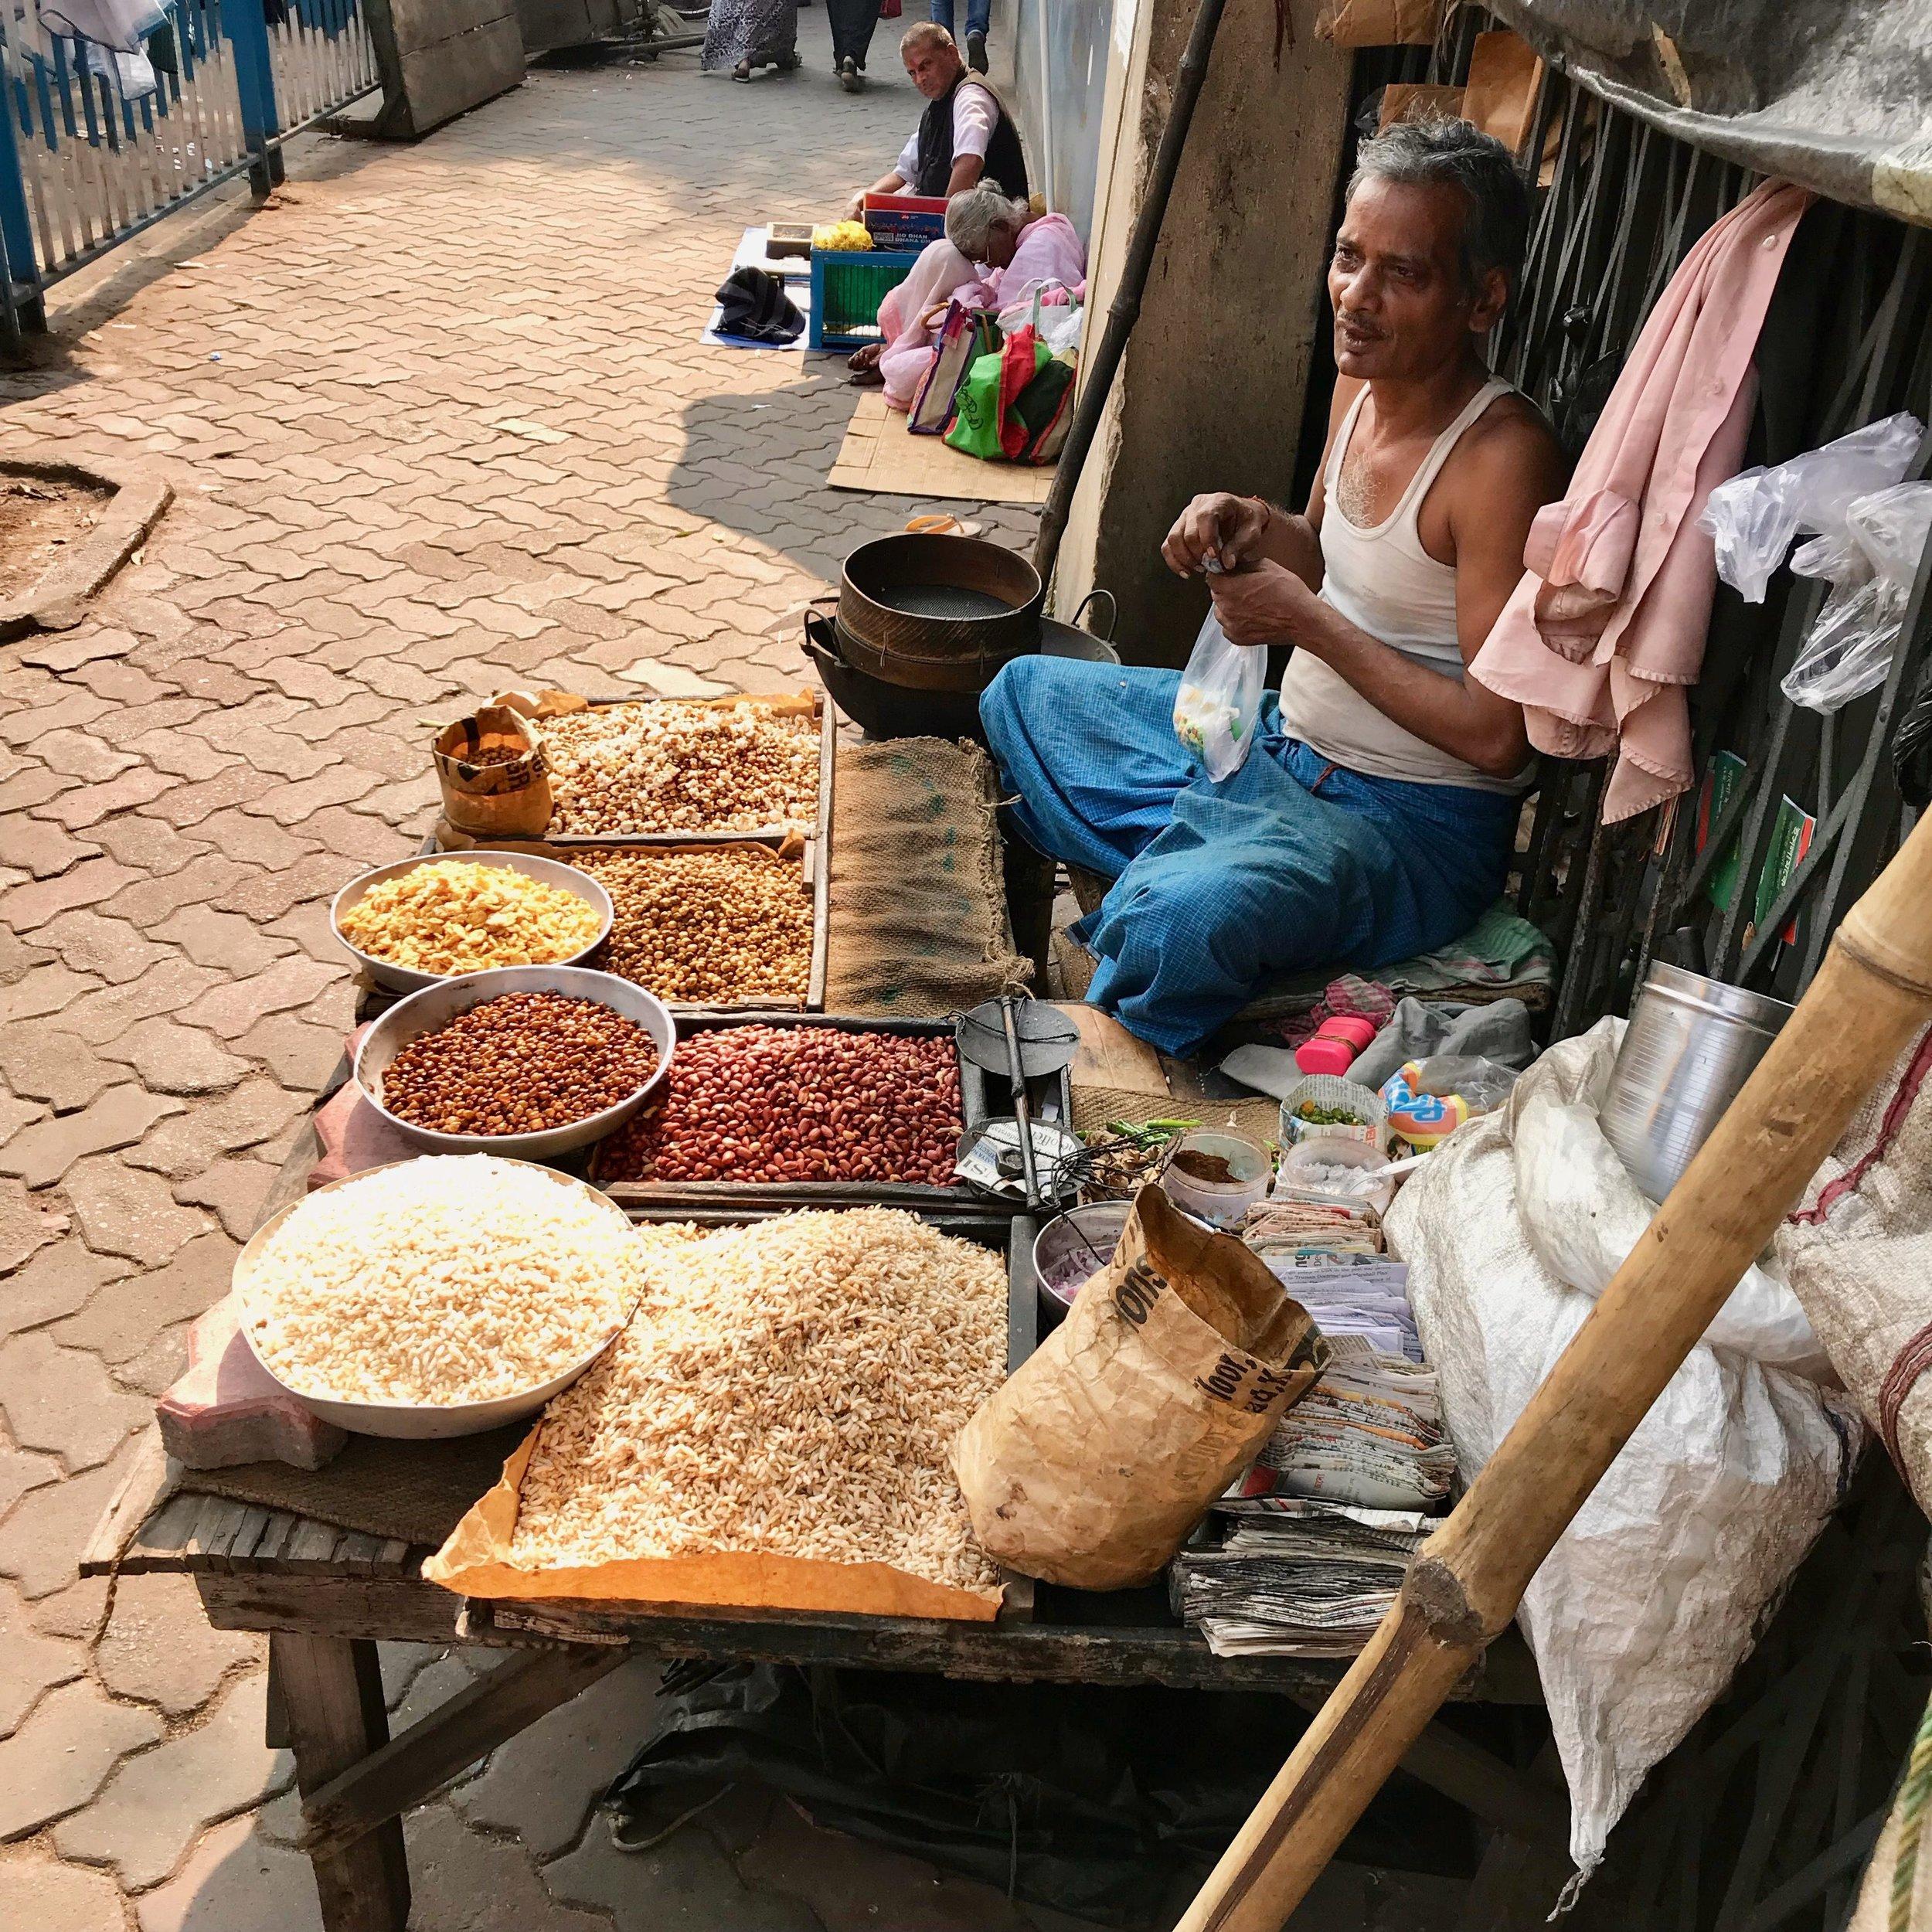 Calcutta (11 au 13 décembre)_11.jpg